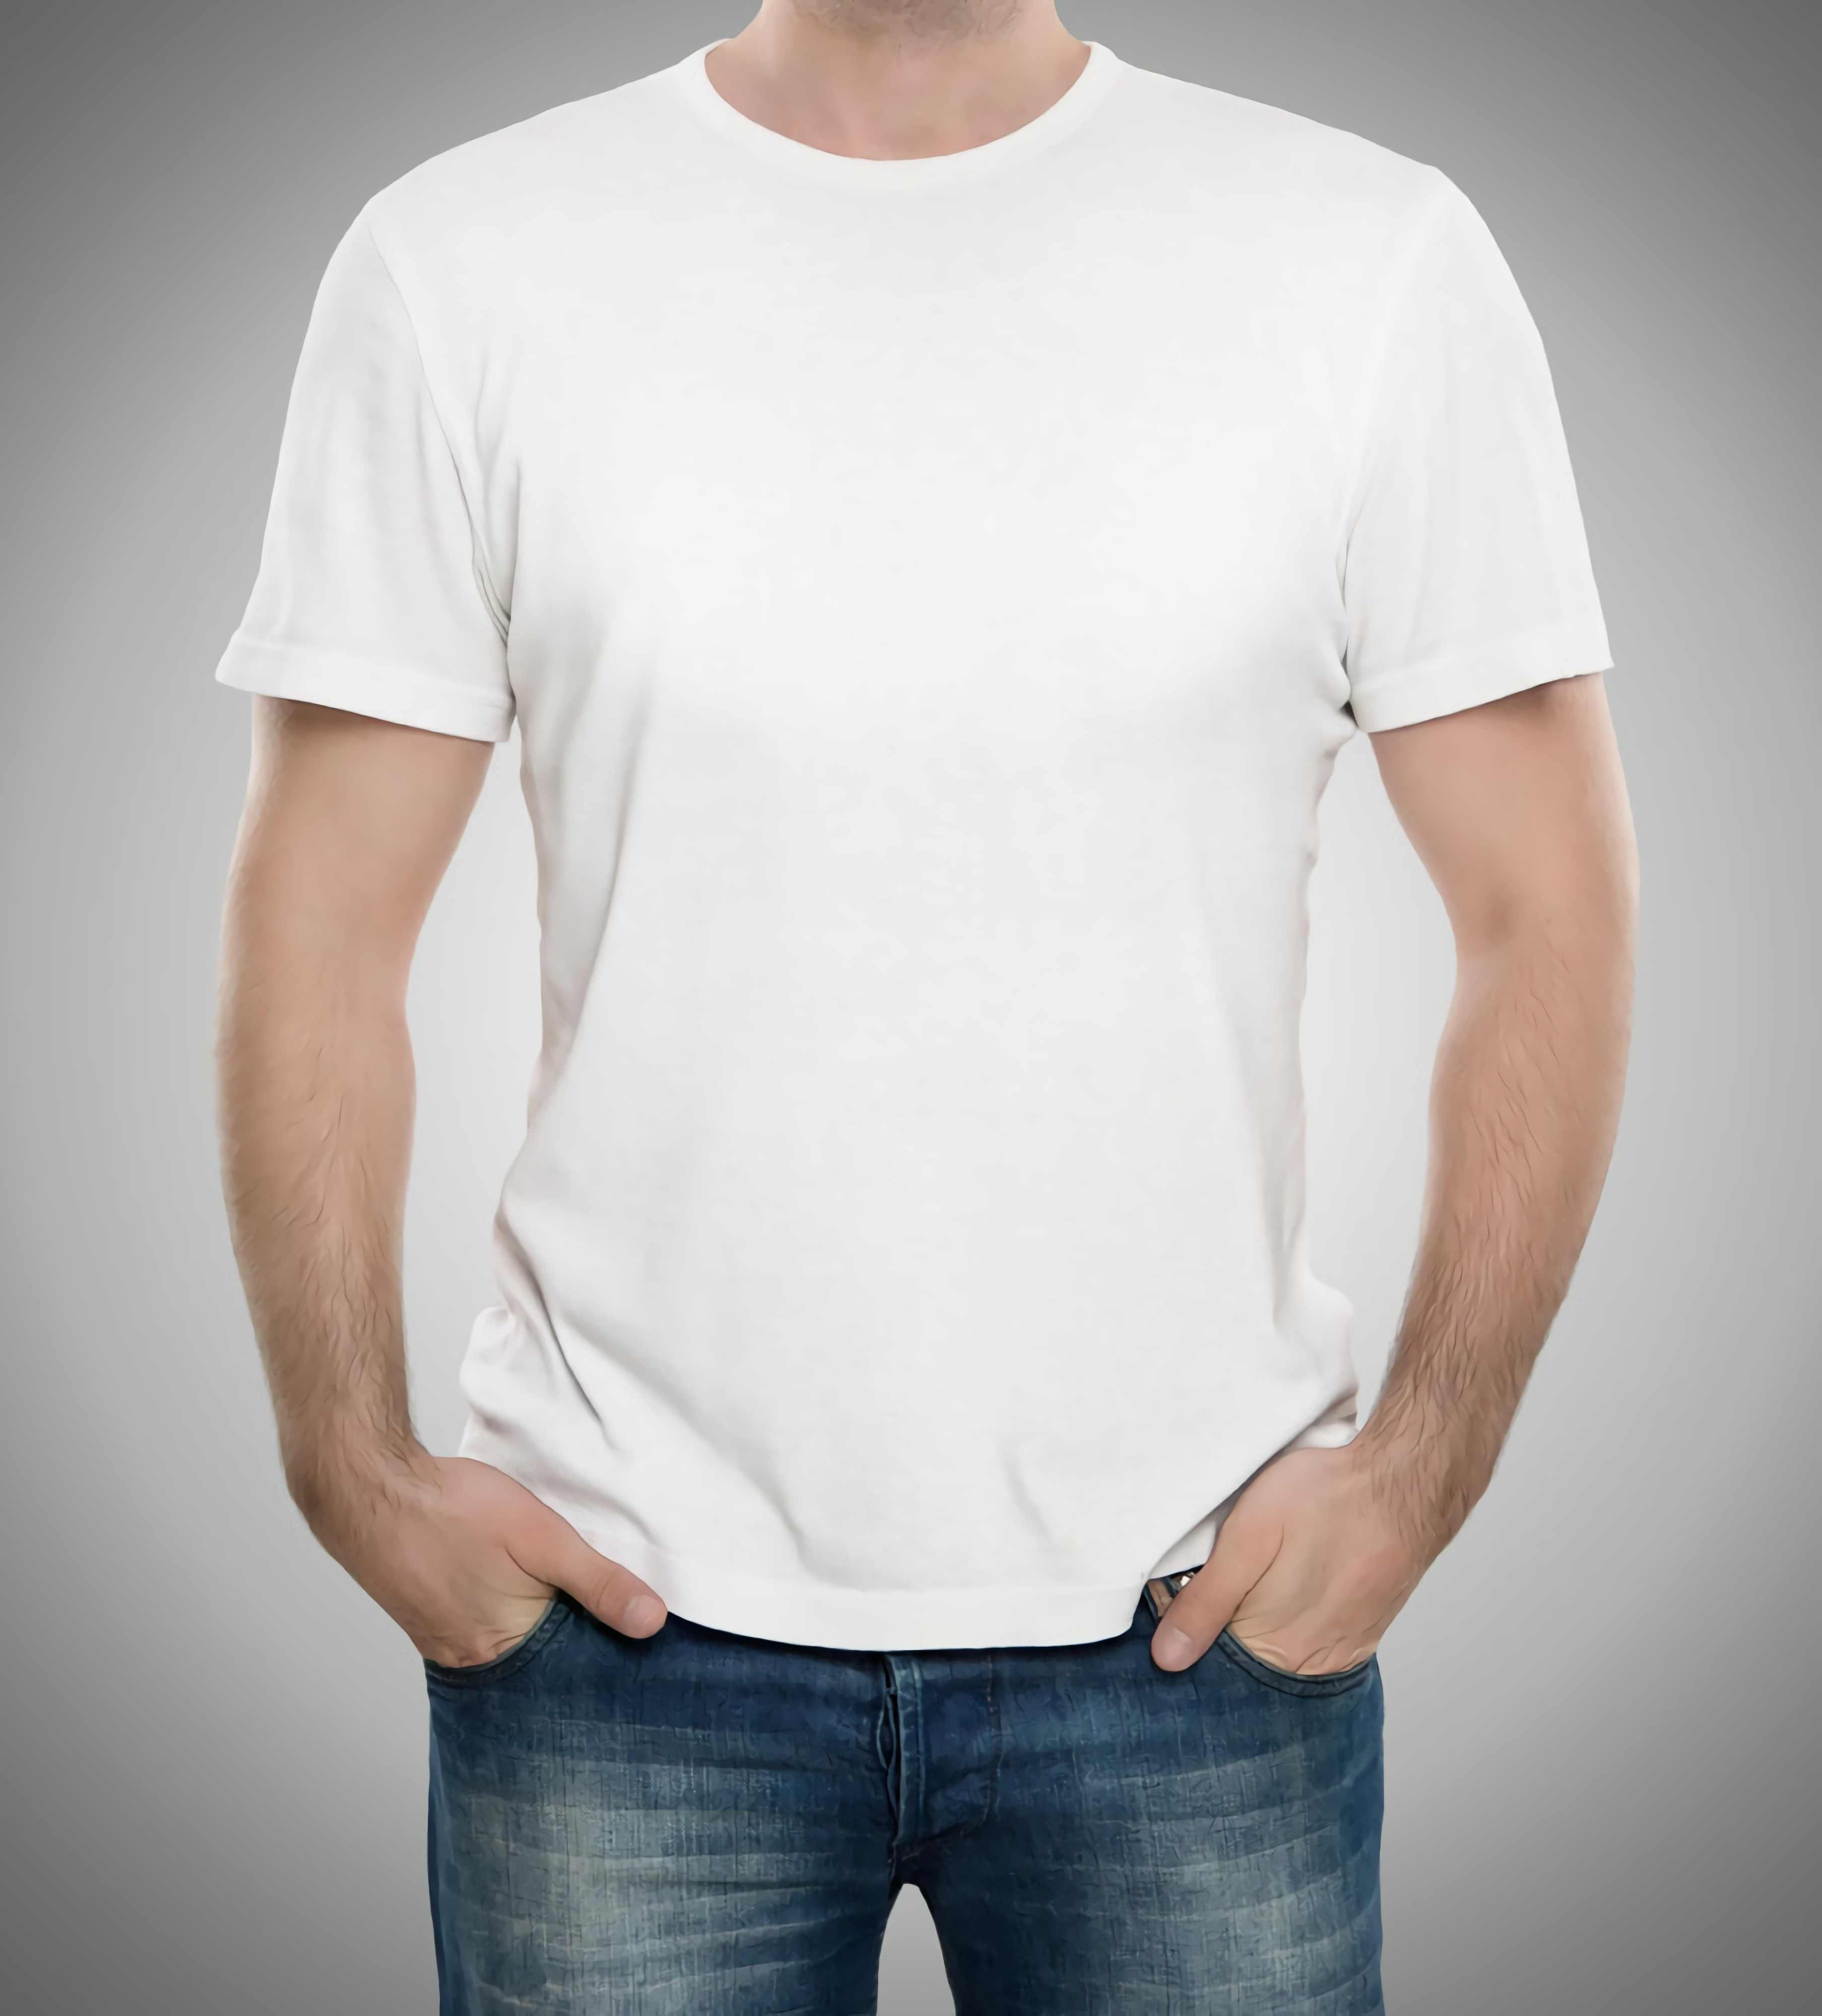 2019 новые Bugs Lola Bunny футбол Микки дисн Спорт Логотип добавки футболки красивый Микки принт для мужчин забавная Футболка Микки